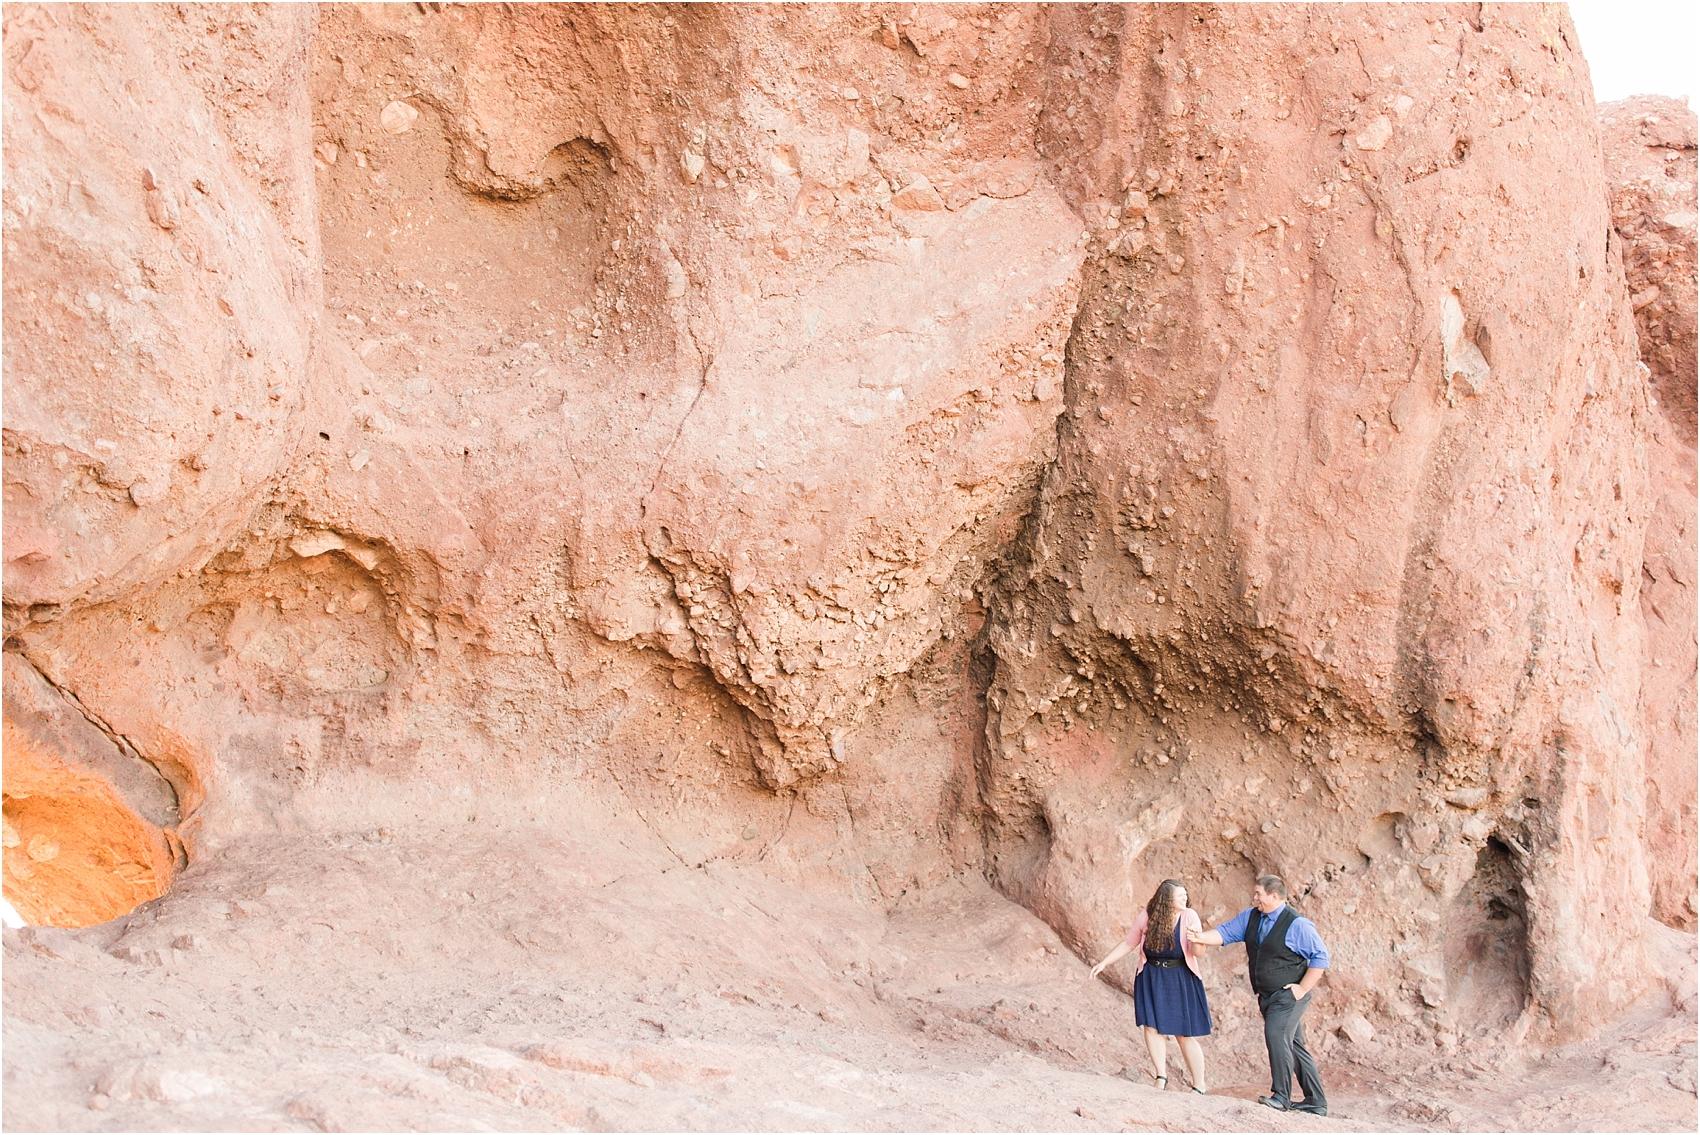 romantic-desert-engagement-photos-in-scottsdale-arizona-courtney-carolyn-photography-by-katelyn-james_0019.jpg